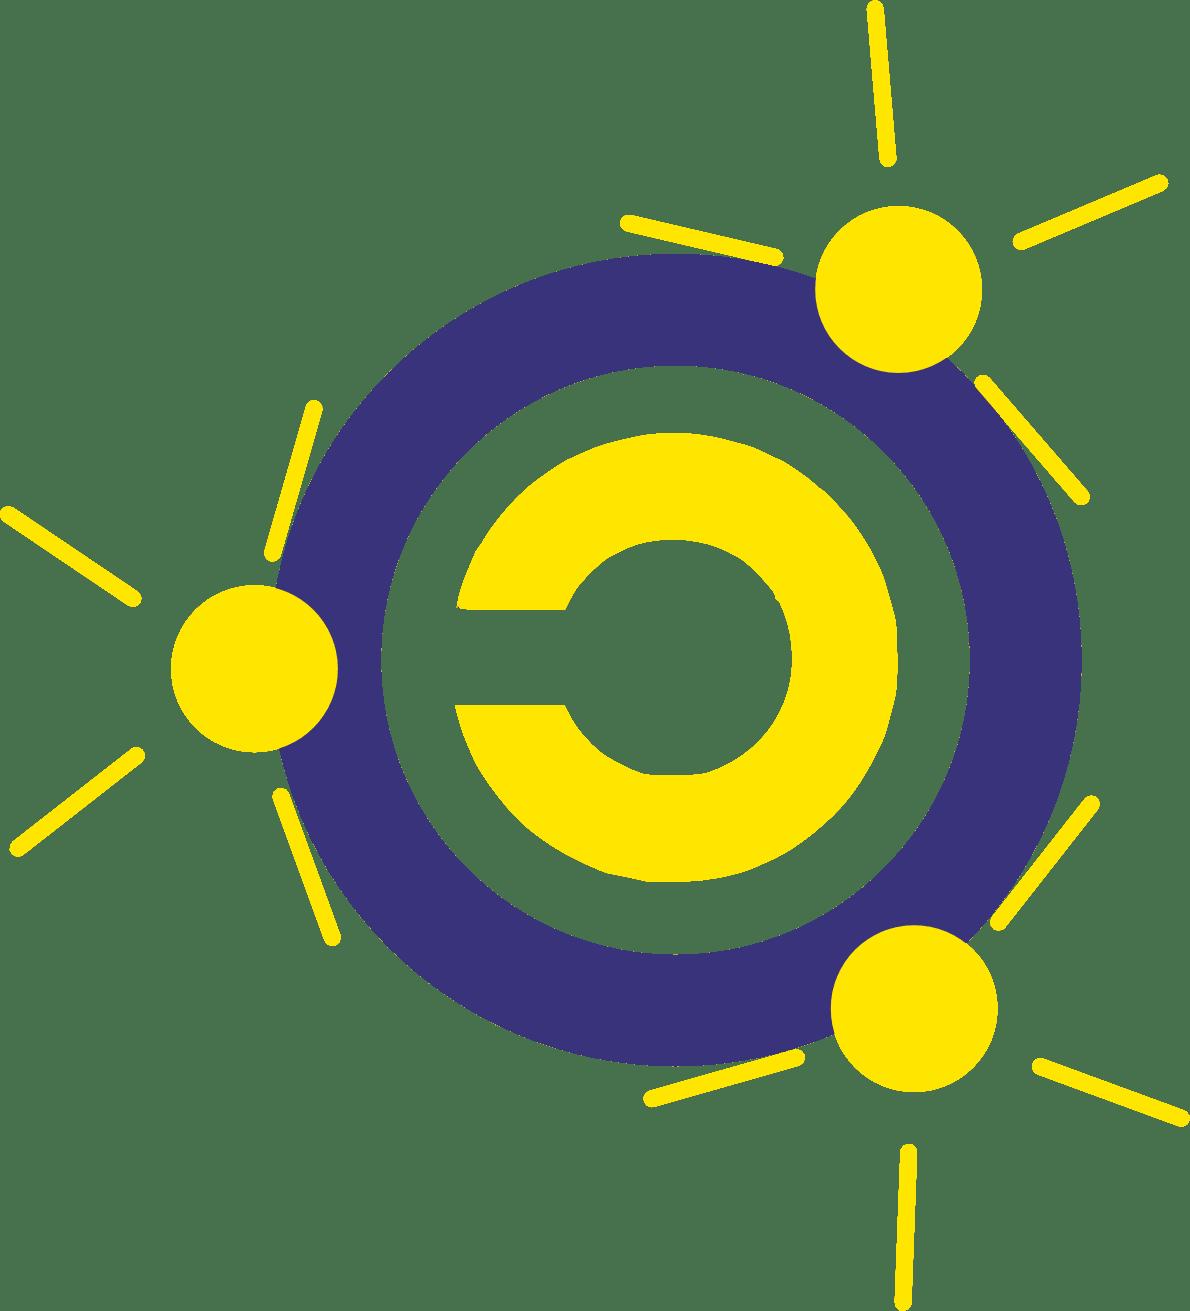 Emmabuntus 2 (12.04.2 LTS) - 32 bits